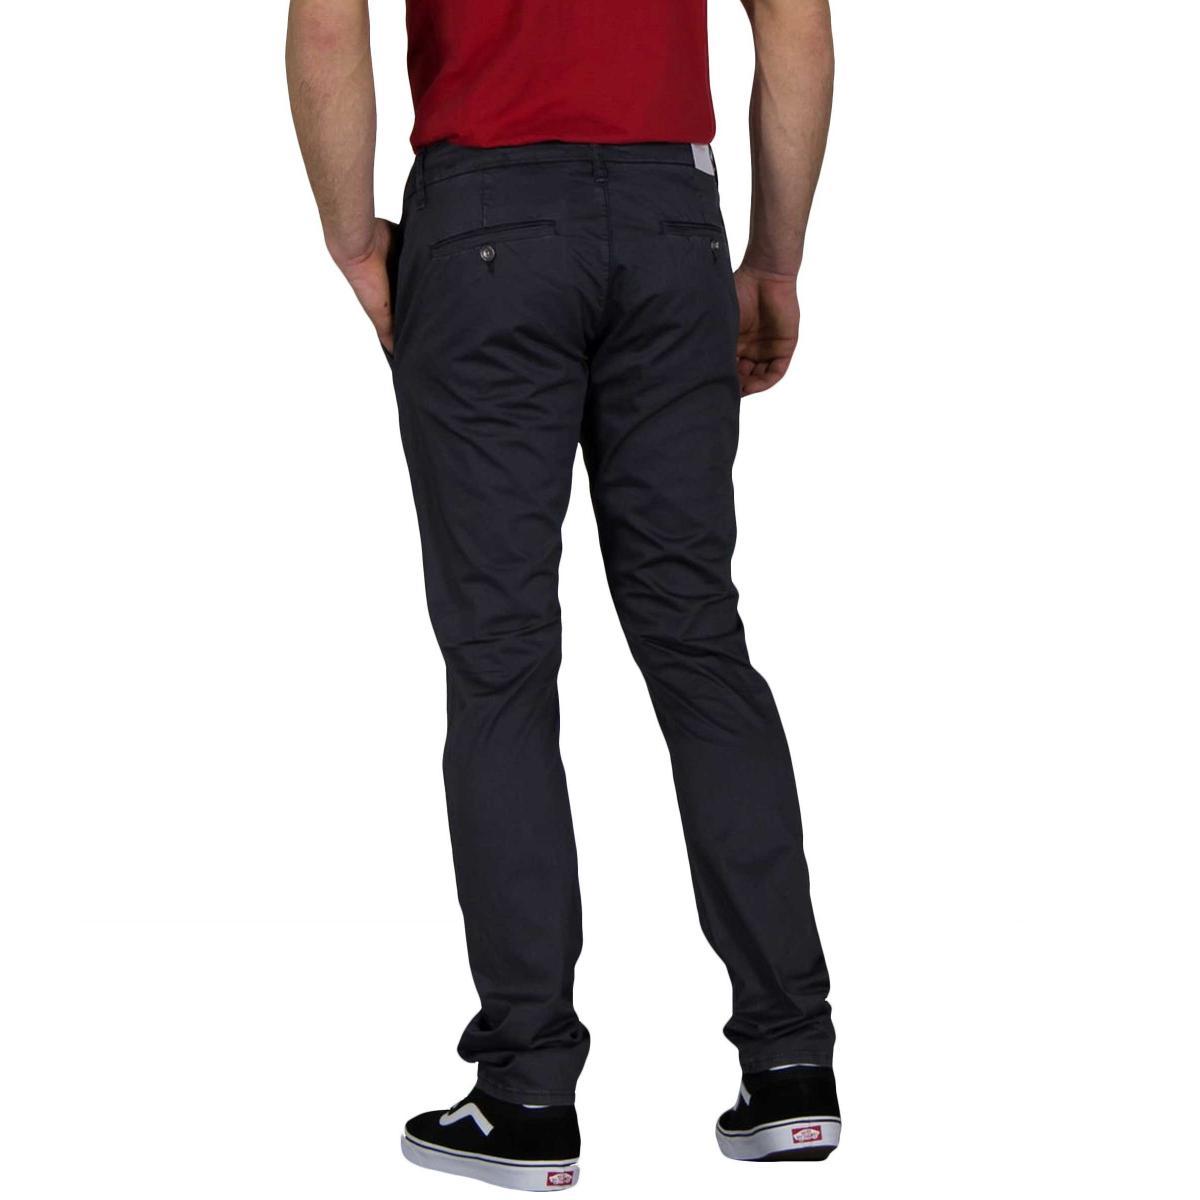 Pantaloni GUESS Daniel modello chino skinny da uomo rif. M91B29WB7F0